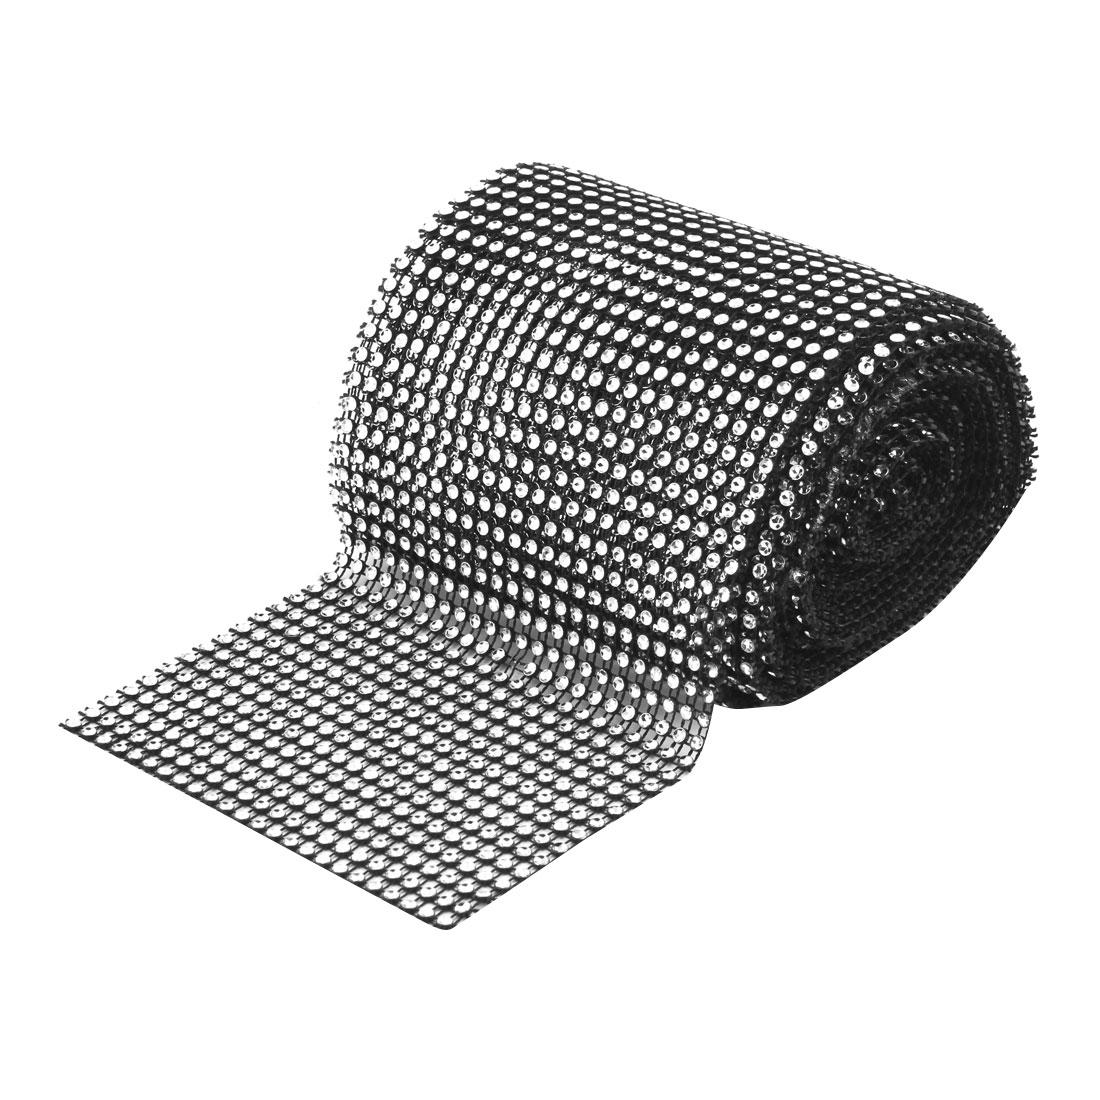 Household Plastic Cake Glass Table Decor Mesh Diamond Ribbon Black and Silver Tone 5 Yard